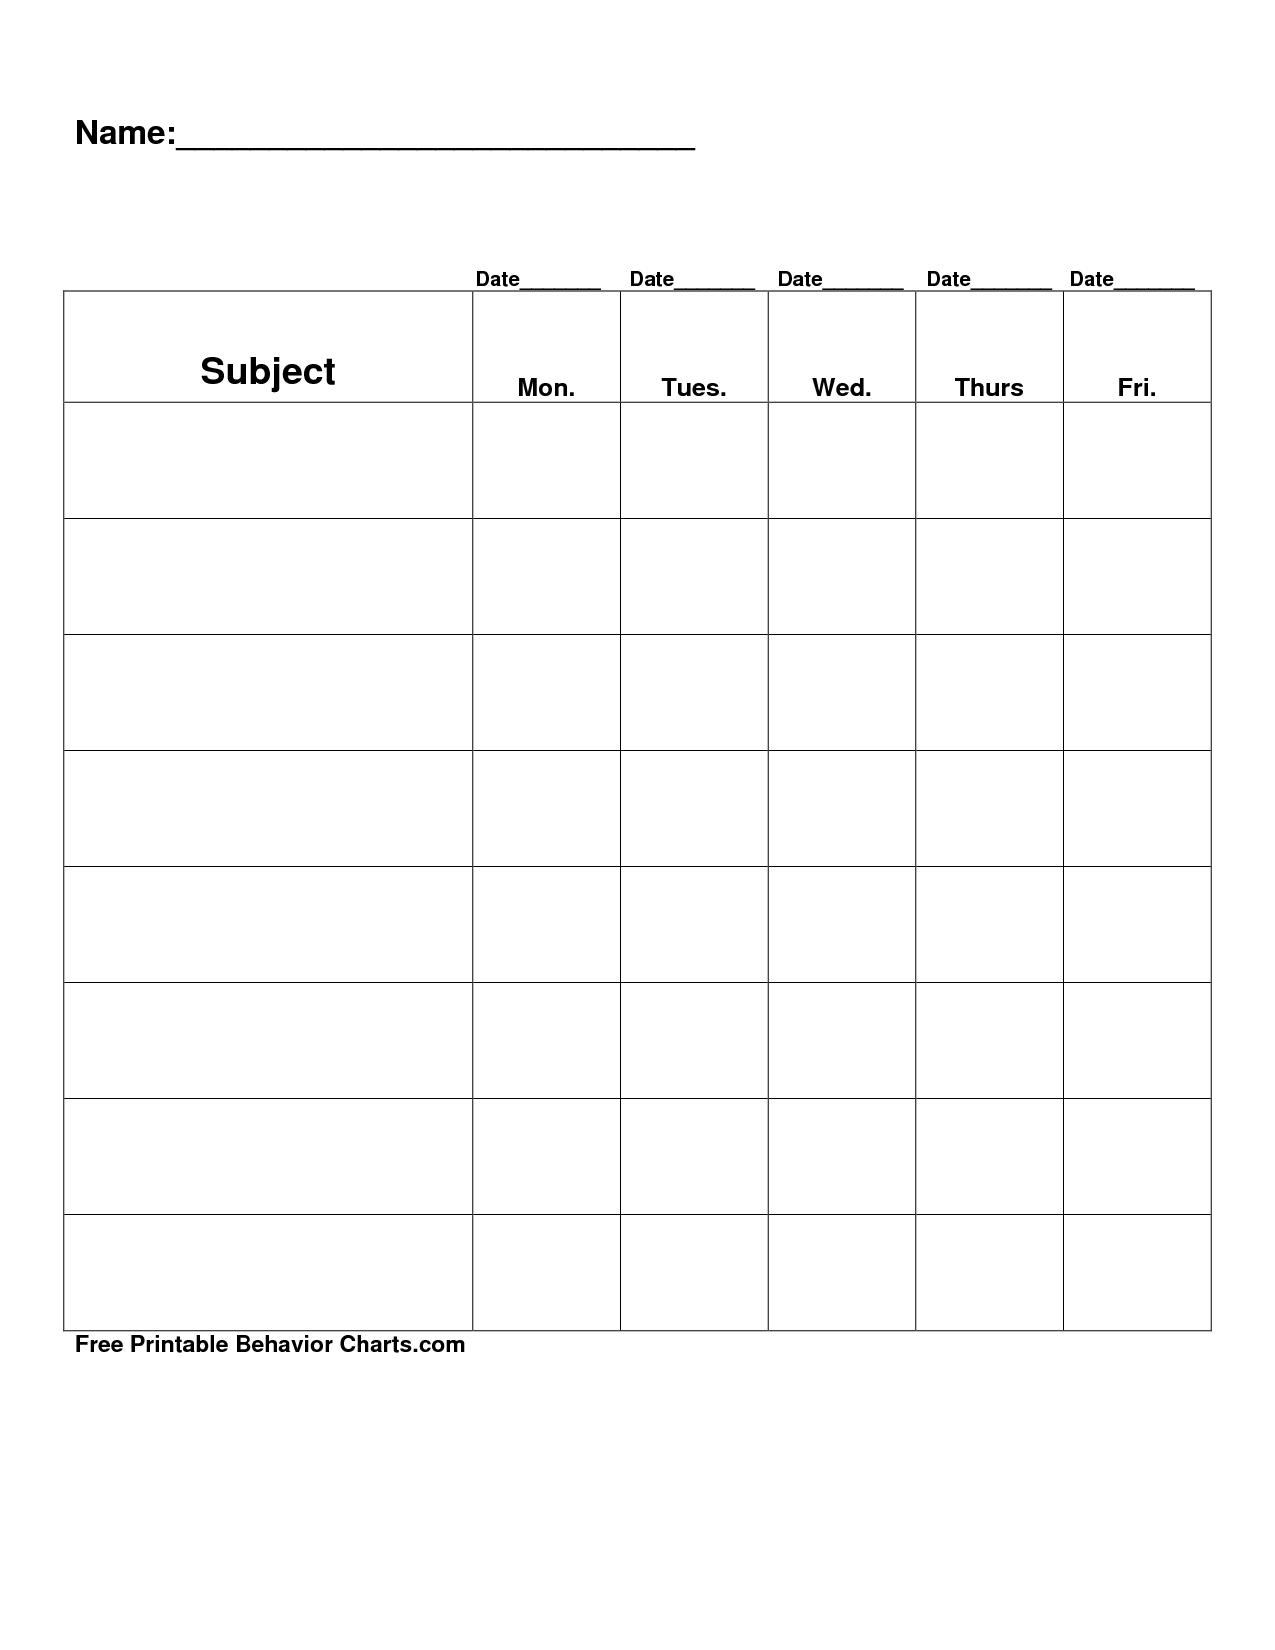 Free Printable Blank Charts | Free Printable Behavior Charts Com - Free Printable Behavior Charts For Elementary Students